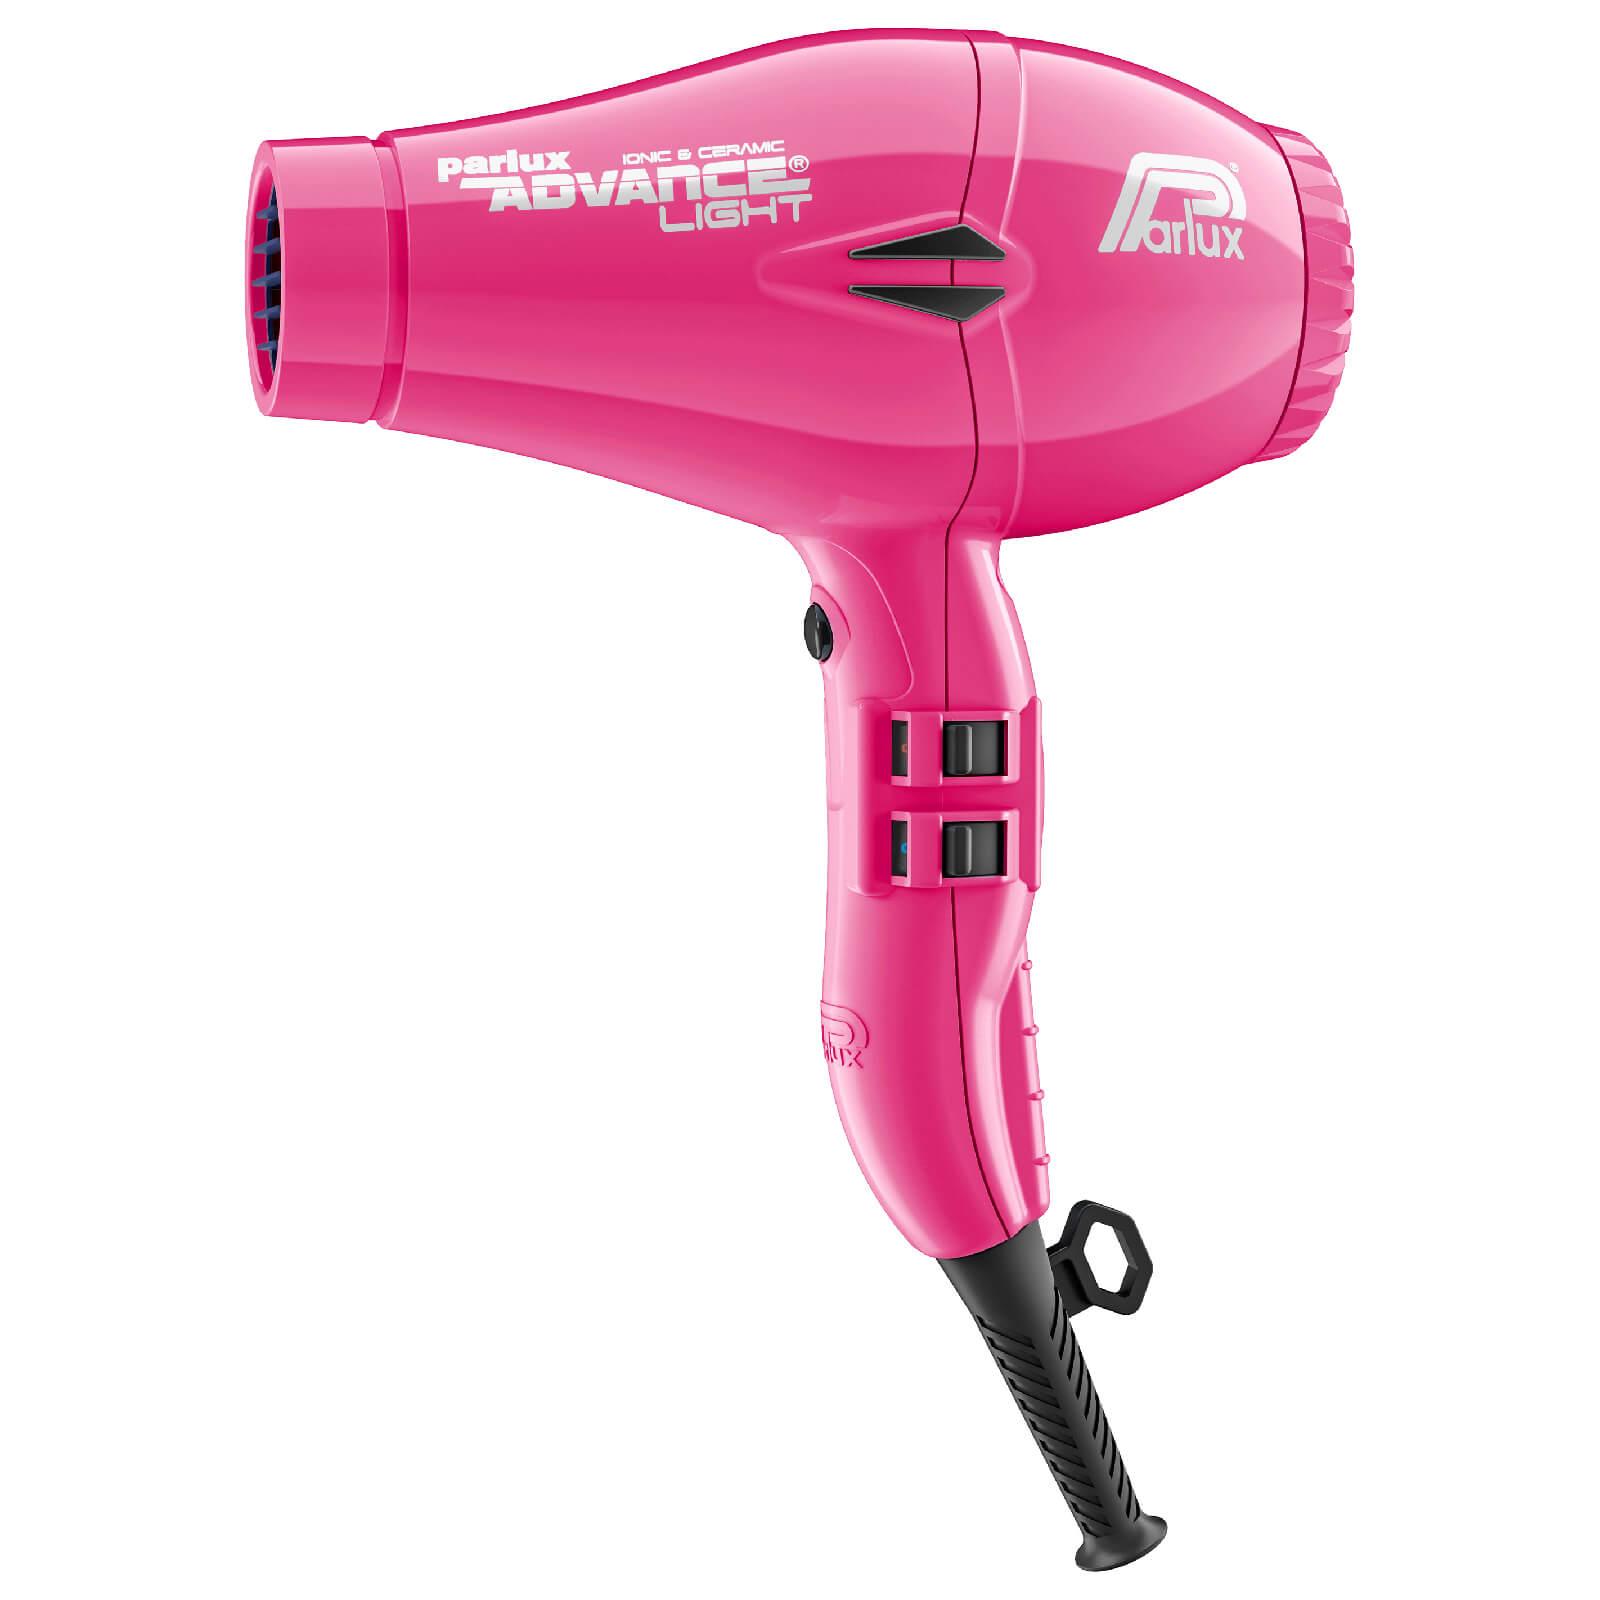 Parlux Advance Light Ceramic Ionic Hair Dryer - Pink - Snabb leverans af155dbf8b3d5